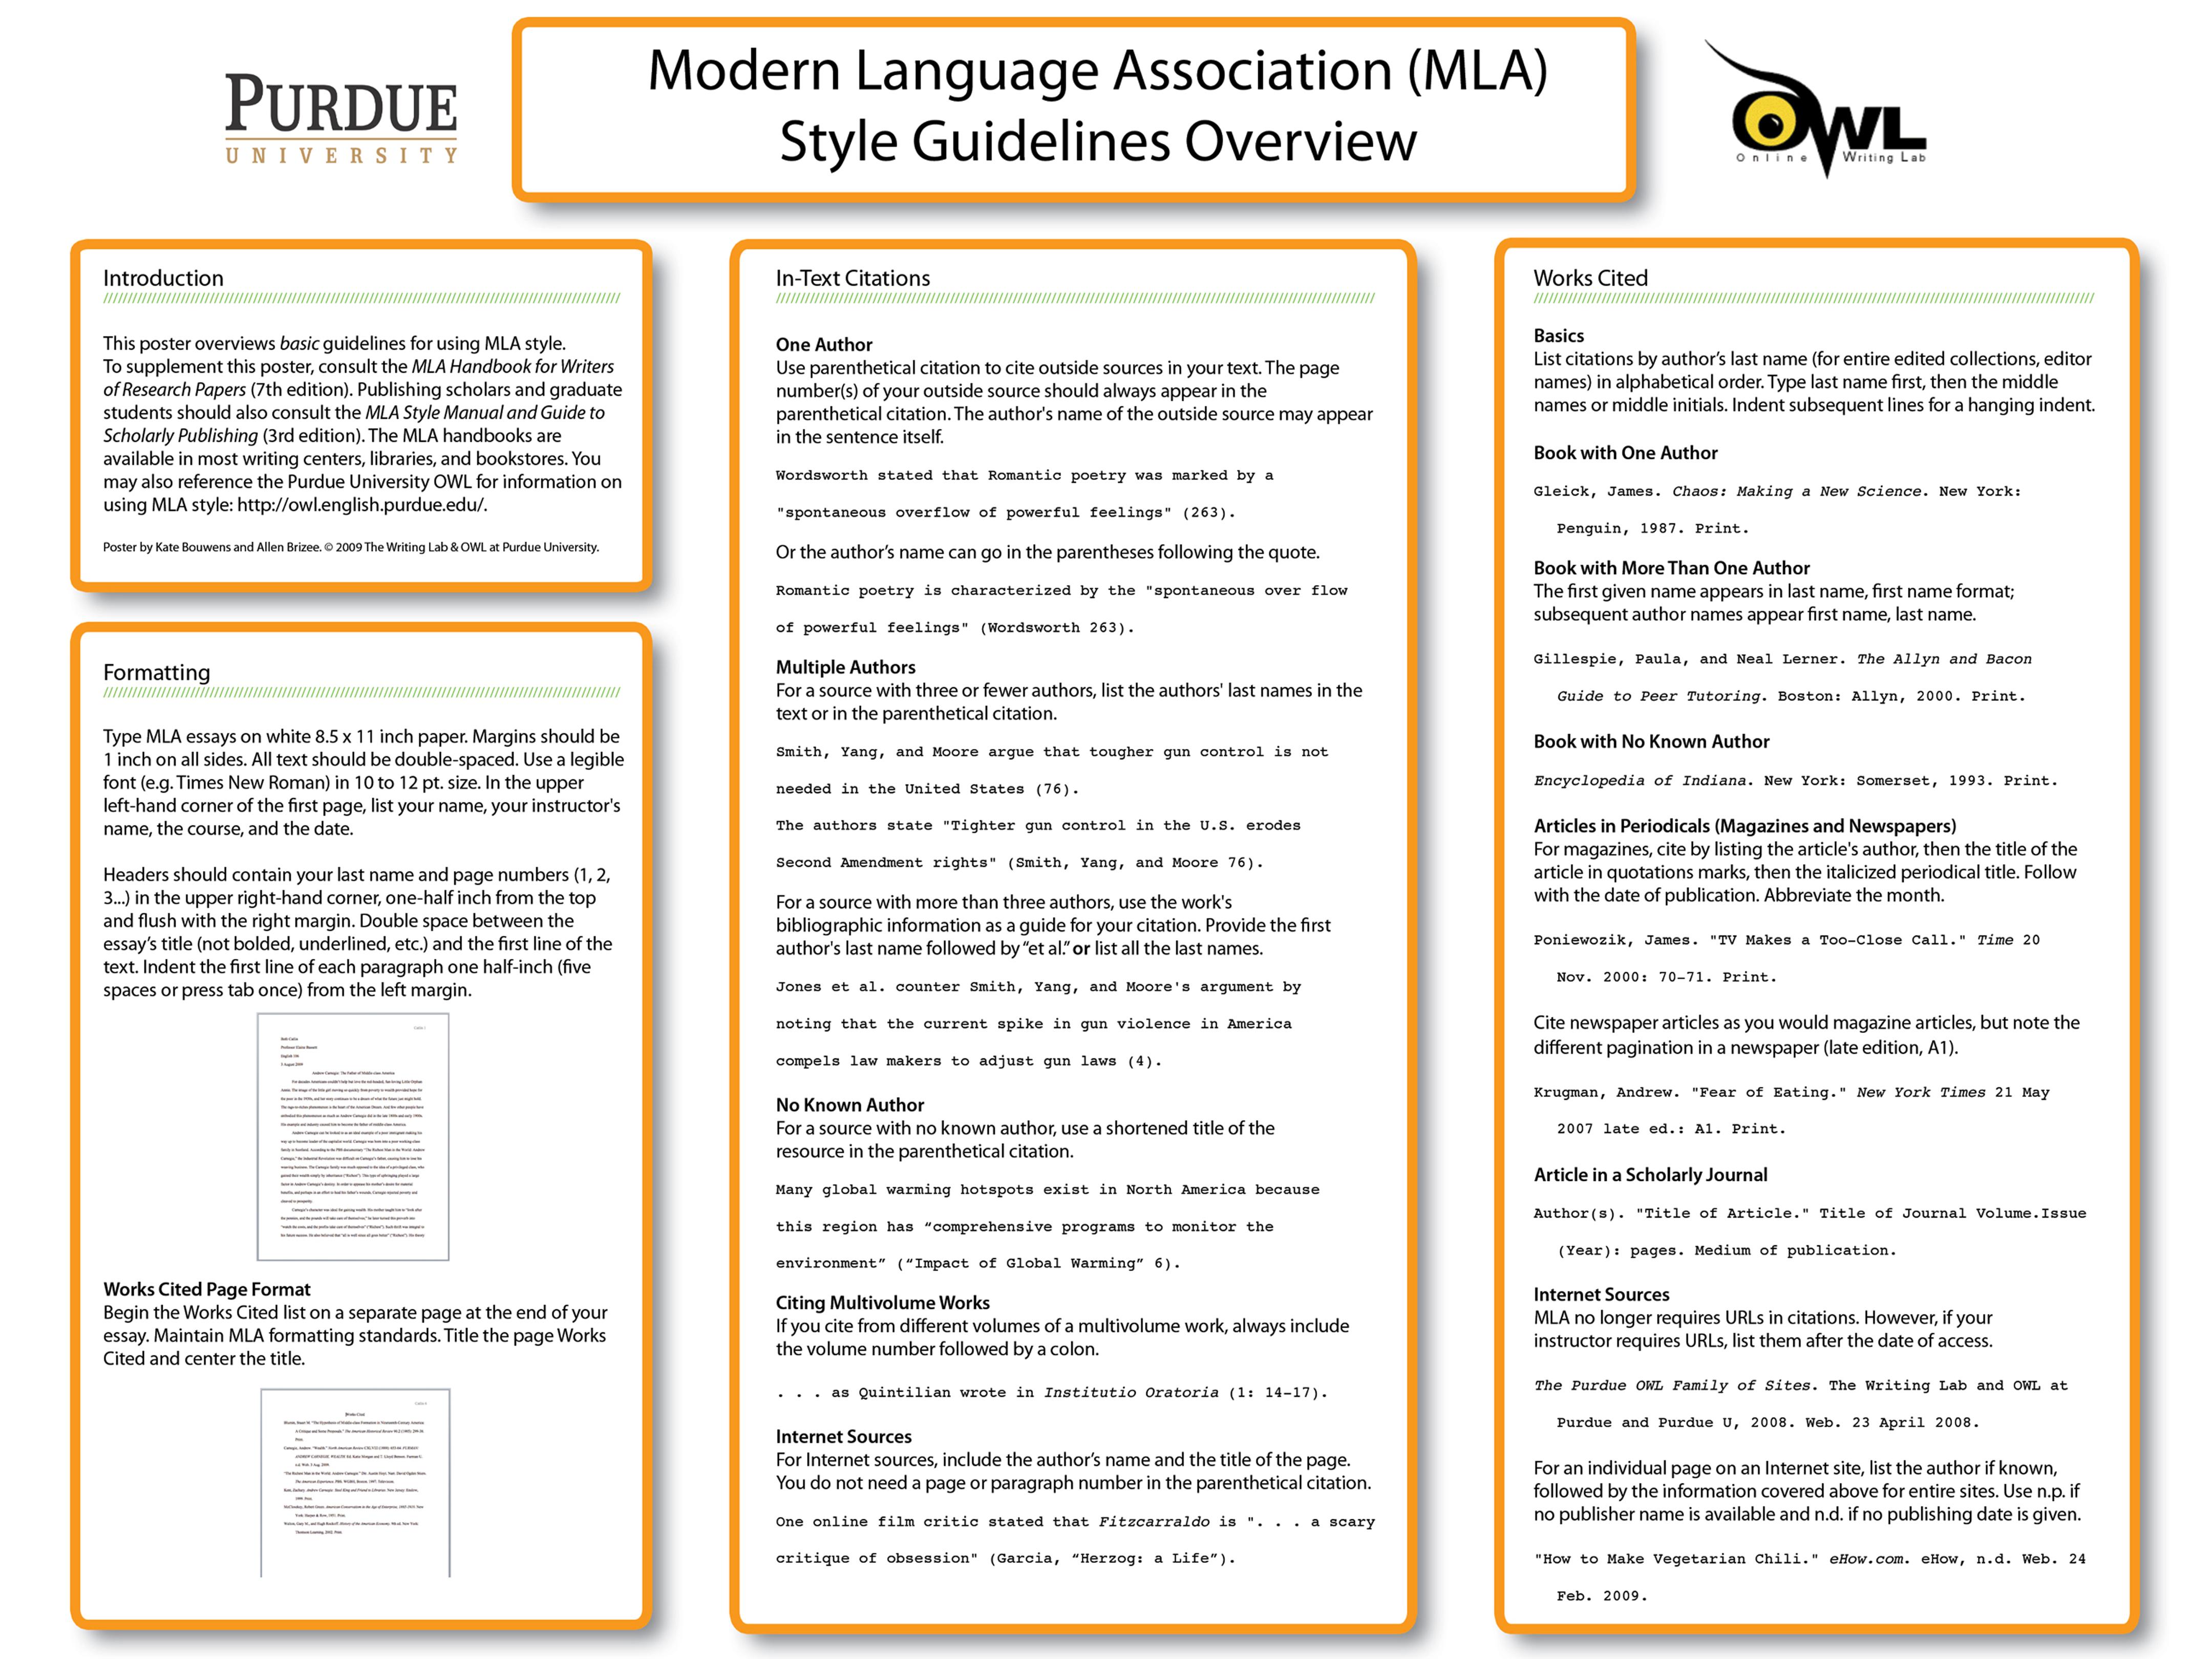 Nyu dissertation guidelines